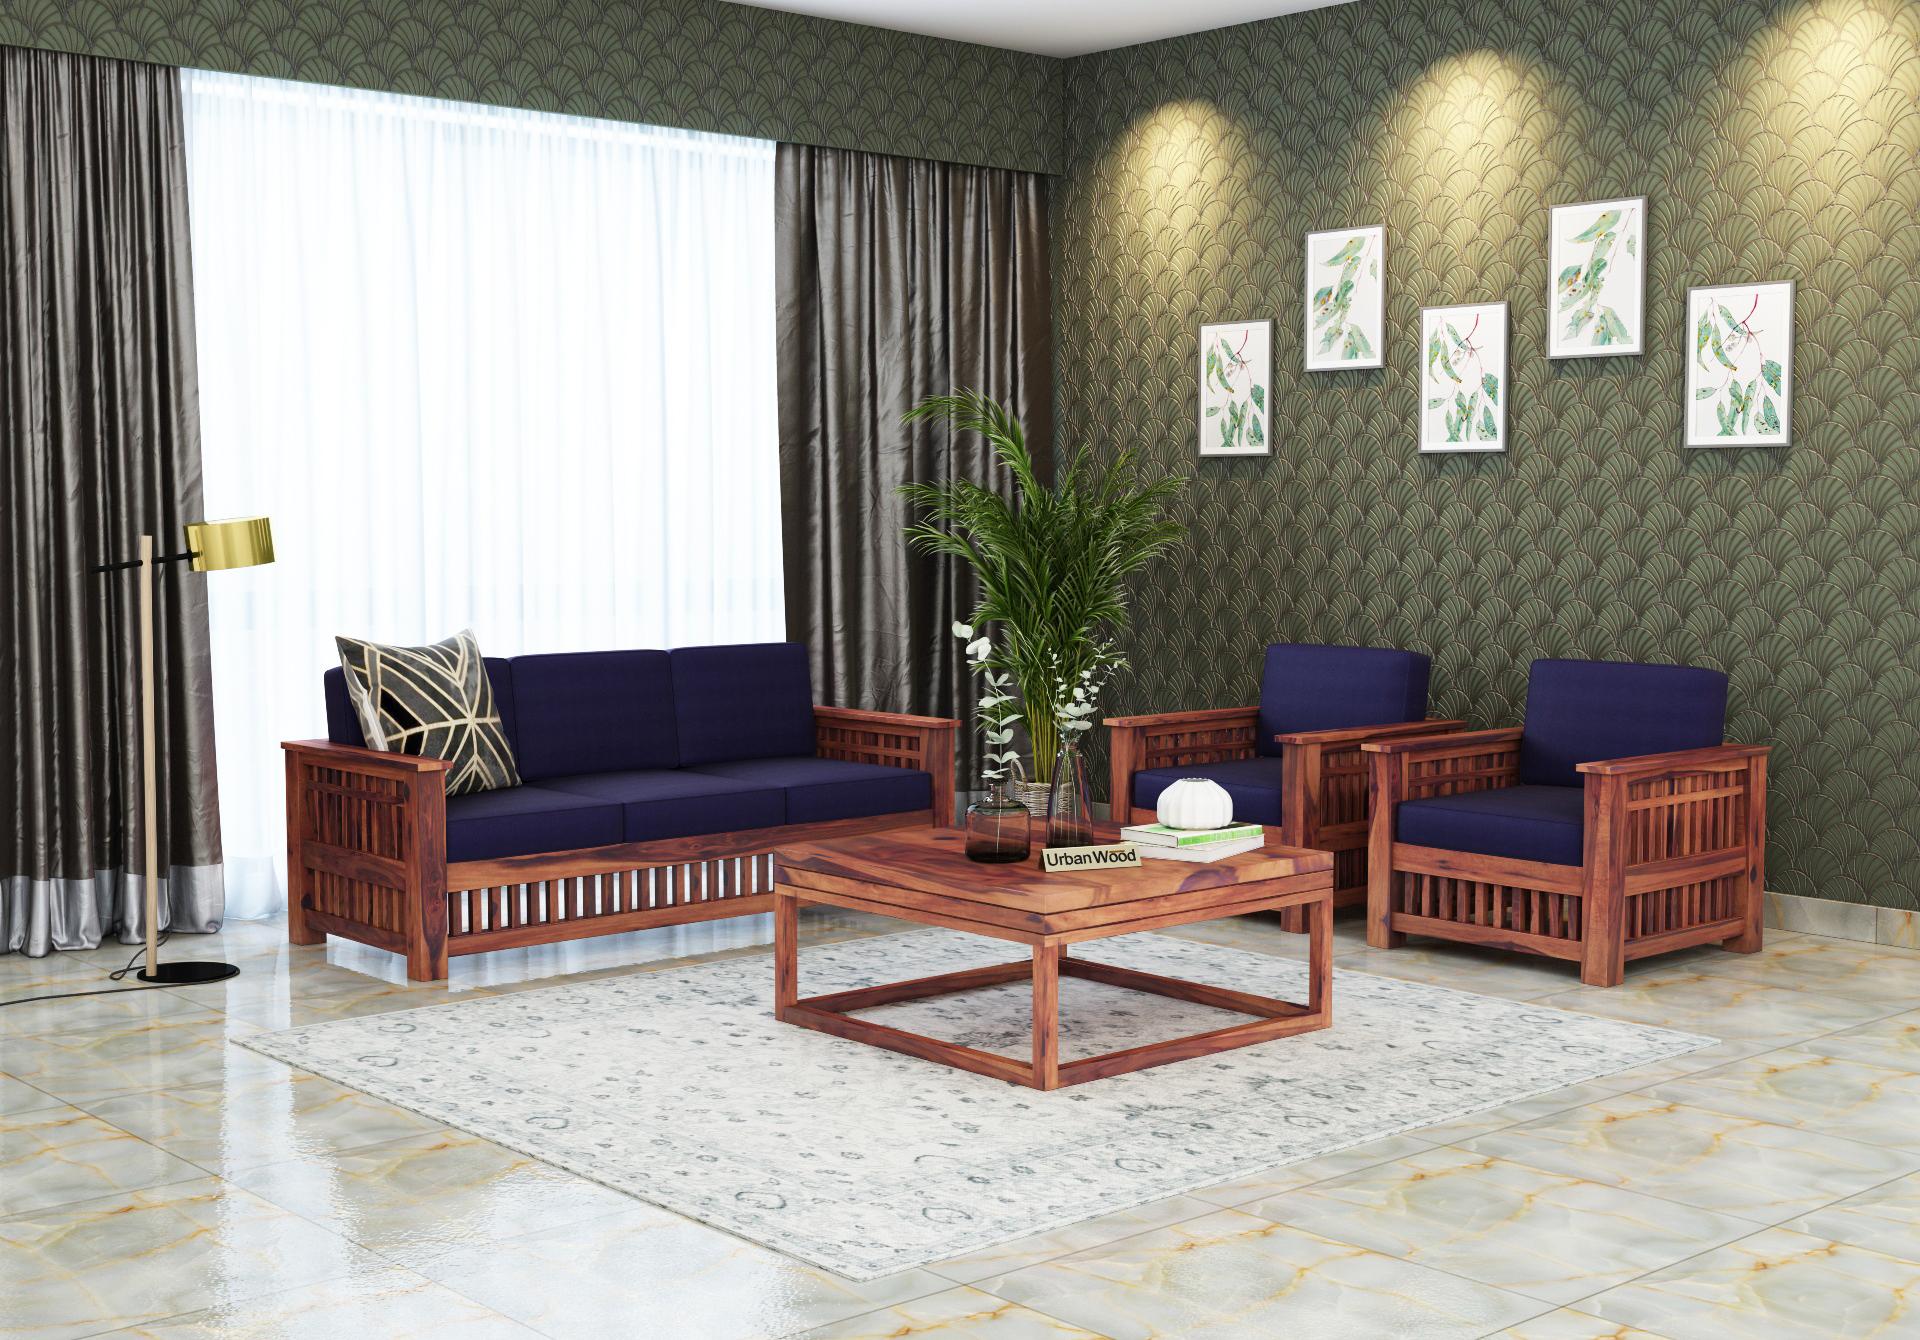 HomeBregg Wooden Sofa Set 3+1+1 Seater <small>( Teak Finish, Navy Blue )</small>